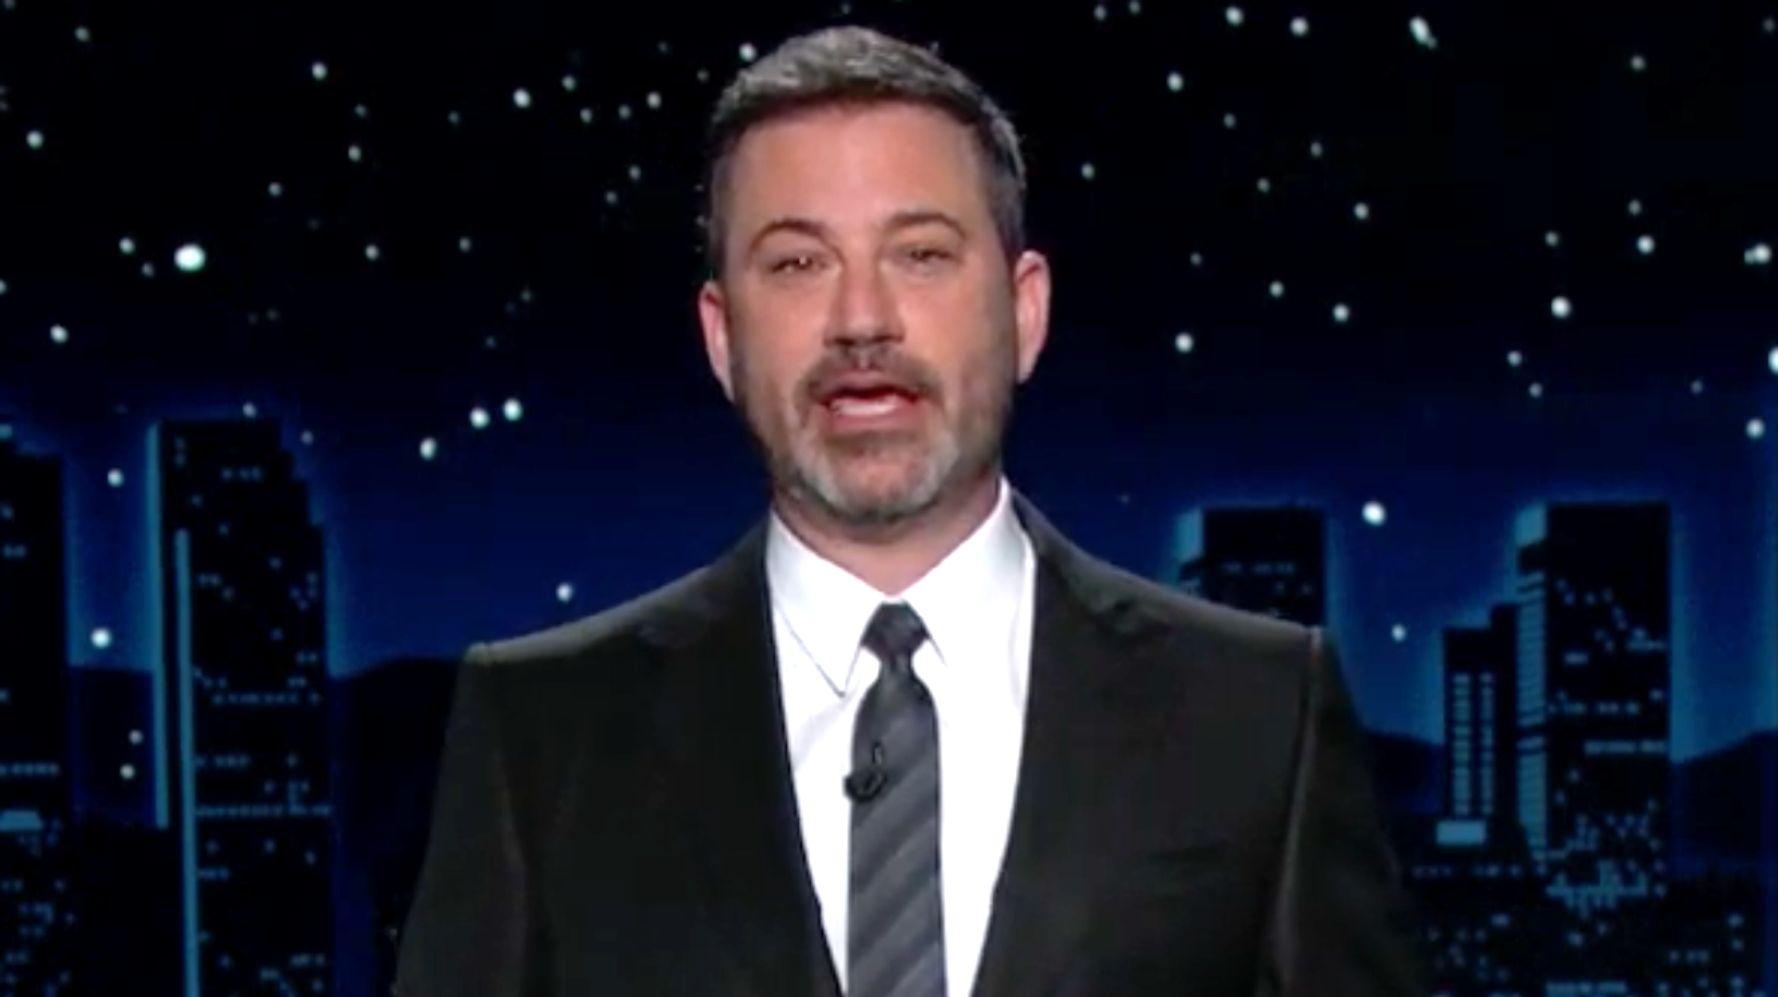 Jimmy Kimmel Roasts New Presidential Debate Rule: Like 'Zoom Kindergarten'